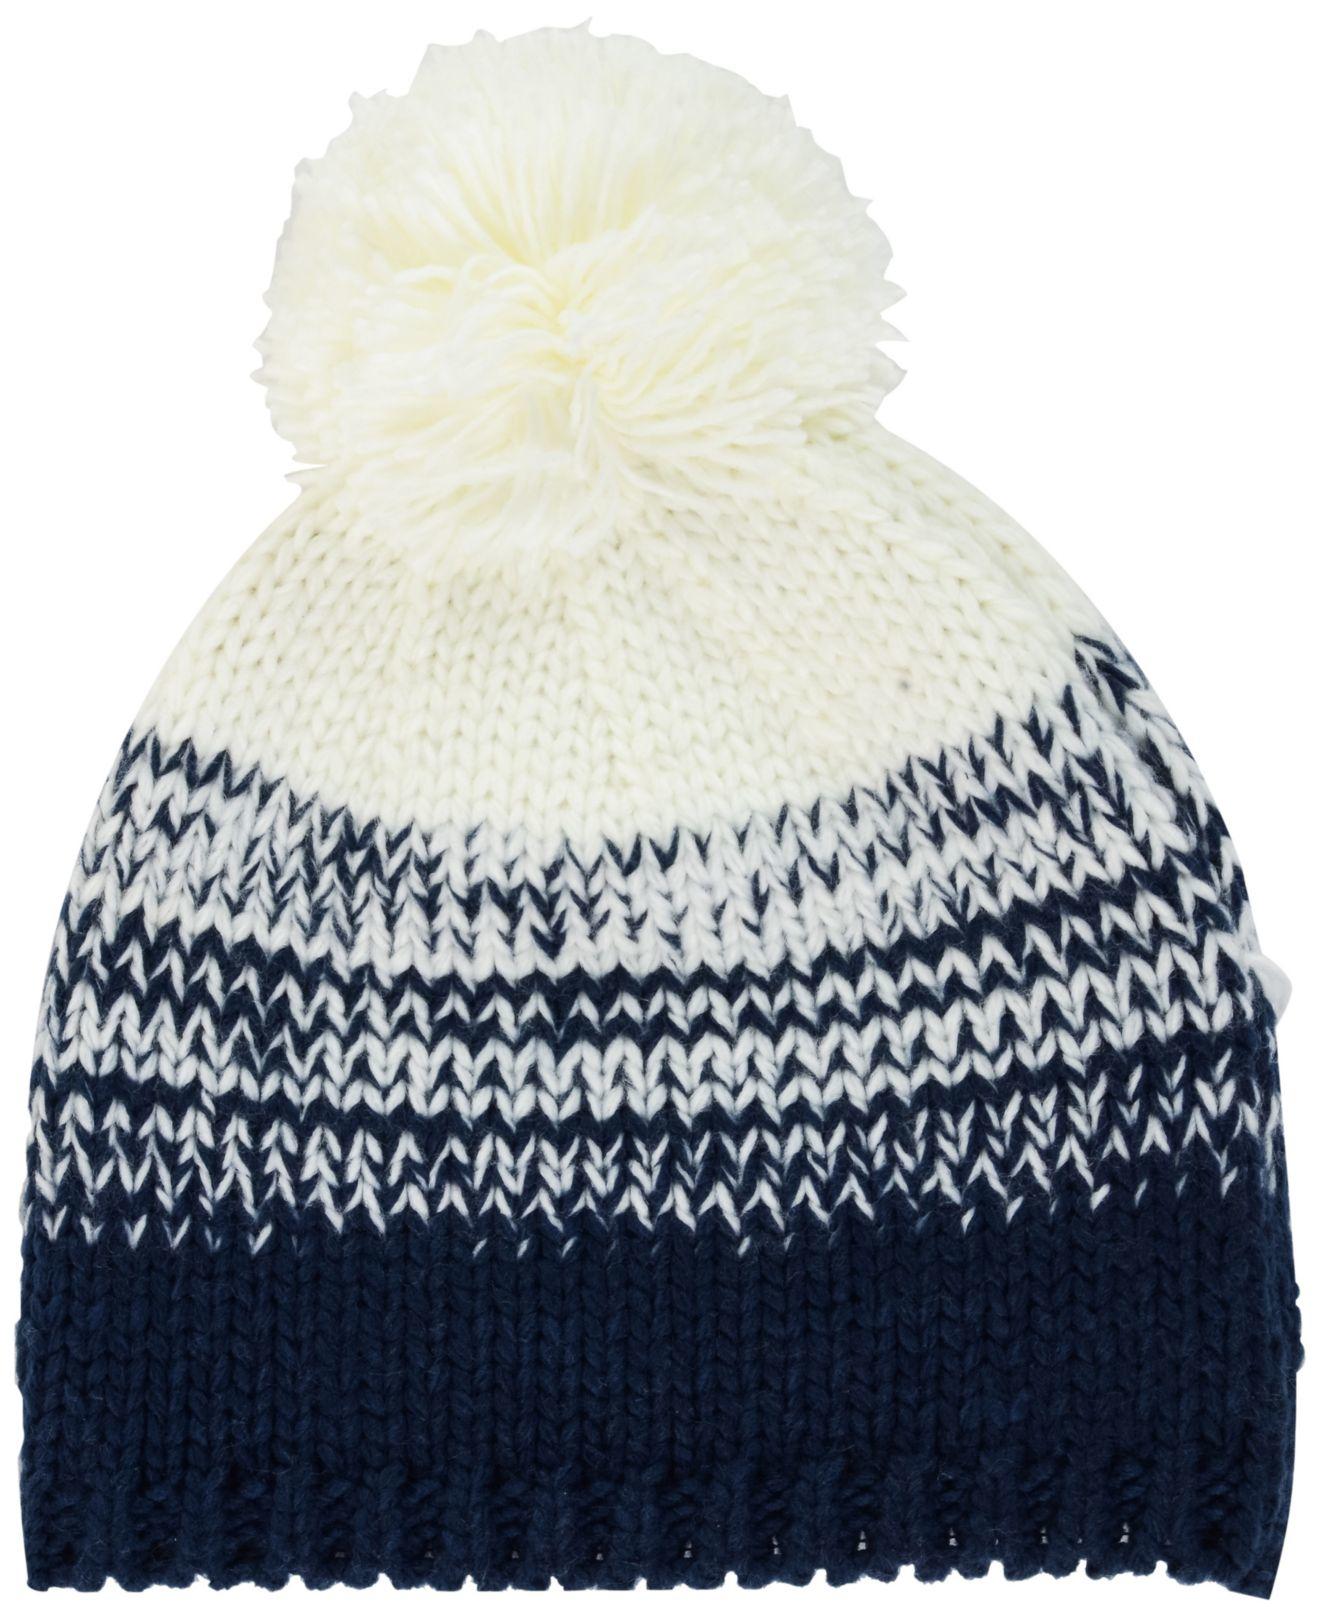 cheaper f60a1 312fe KTZ Women s New England Patriots Polar Dust Knit Hat in White - Lyst